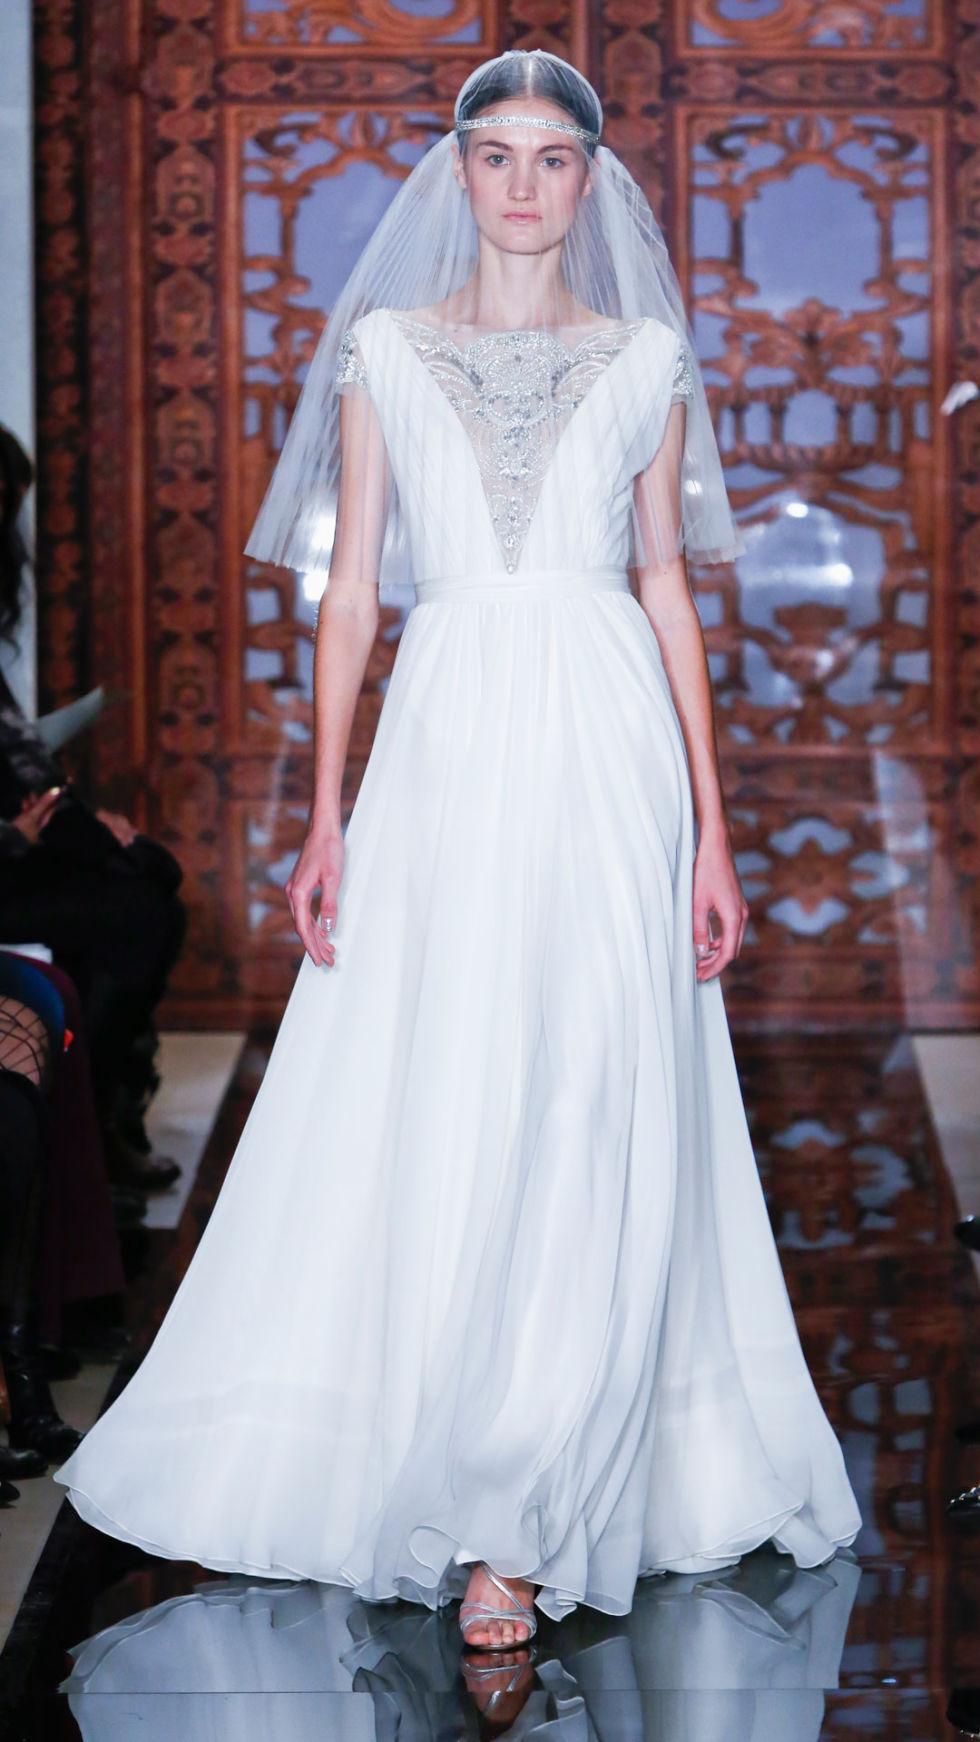 Dolce gabbana wedding dress wedding dresses designs for Dolce and gabbana wedding dresses